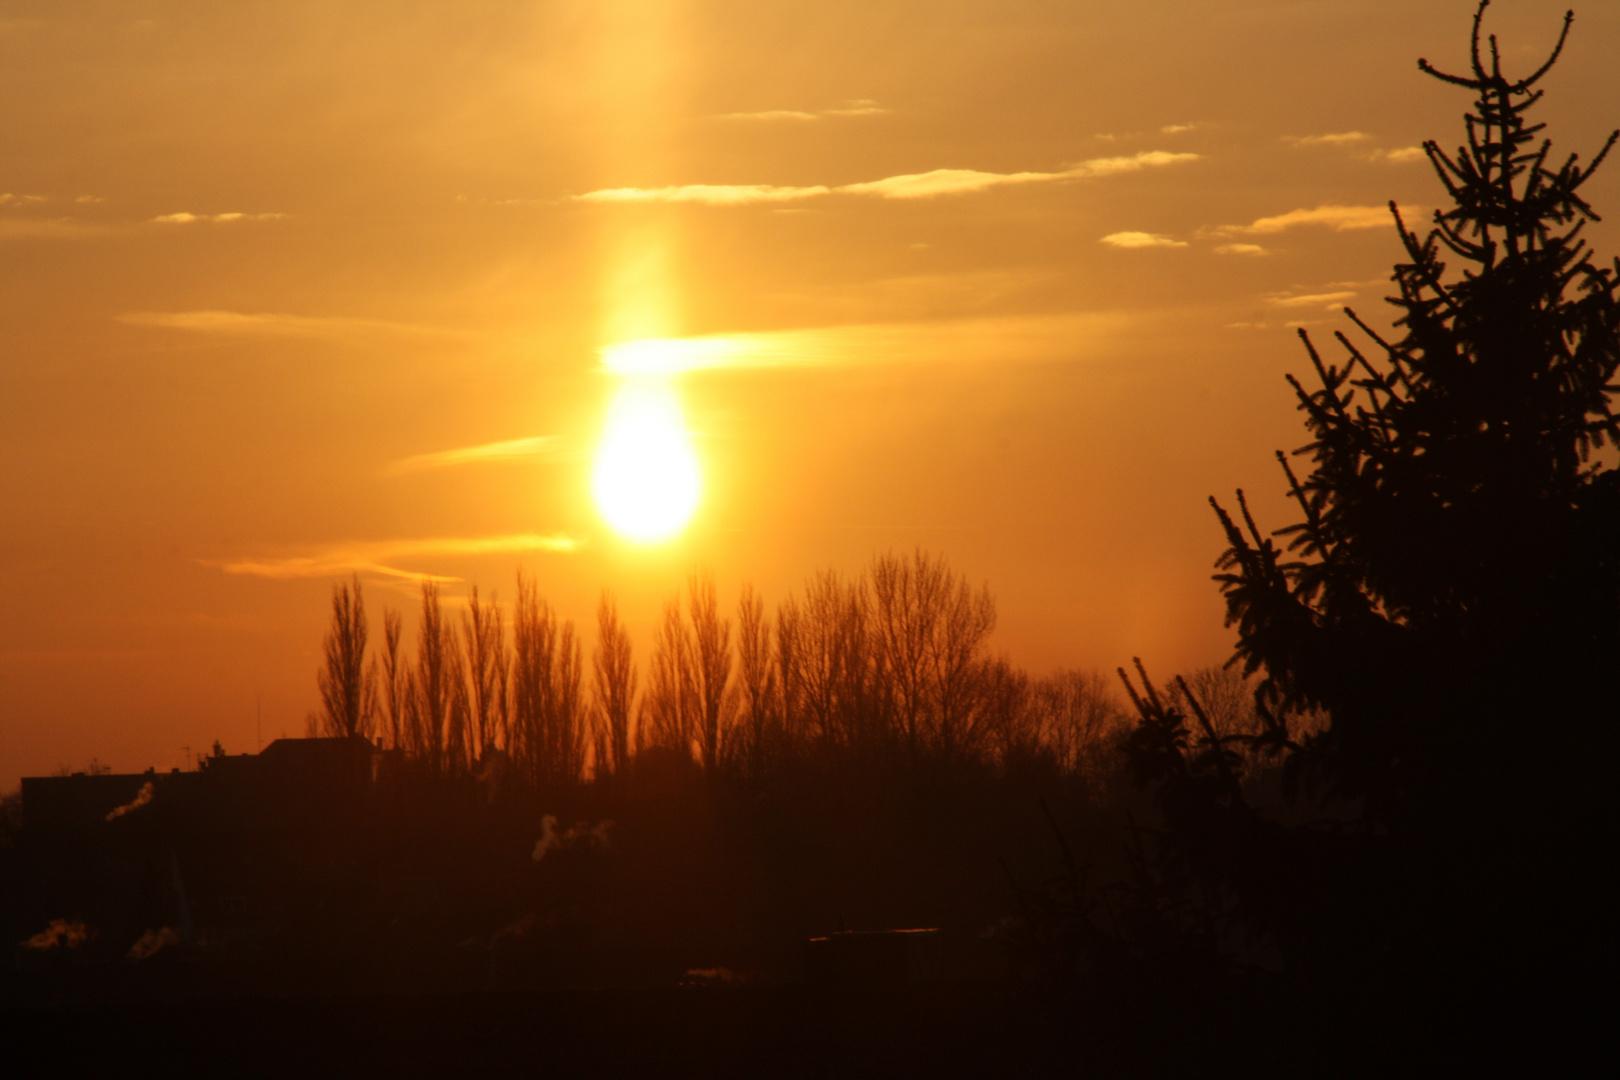 Sonnenaufgang über den Dächern